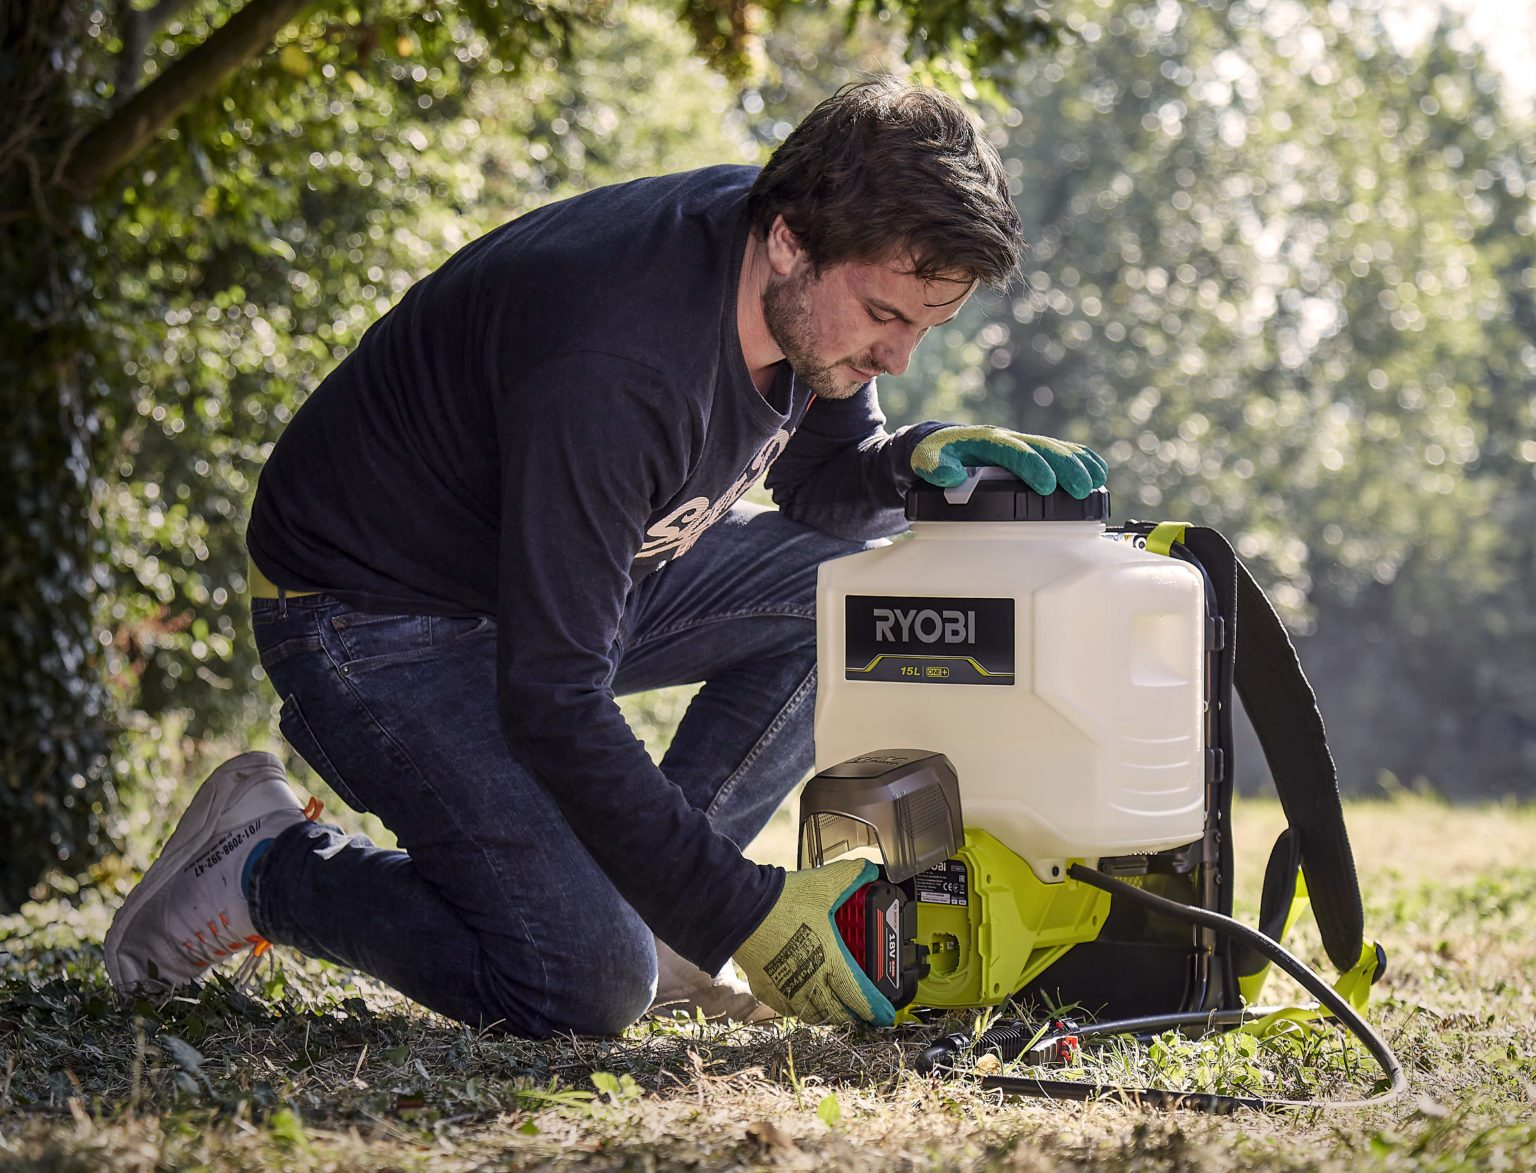 Inserting Badaptor into weed sprayer